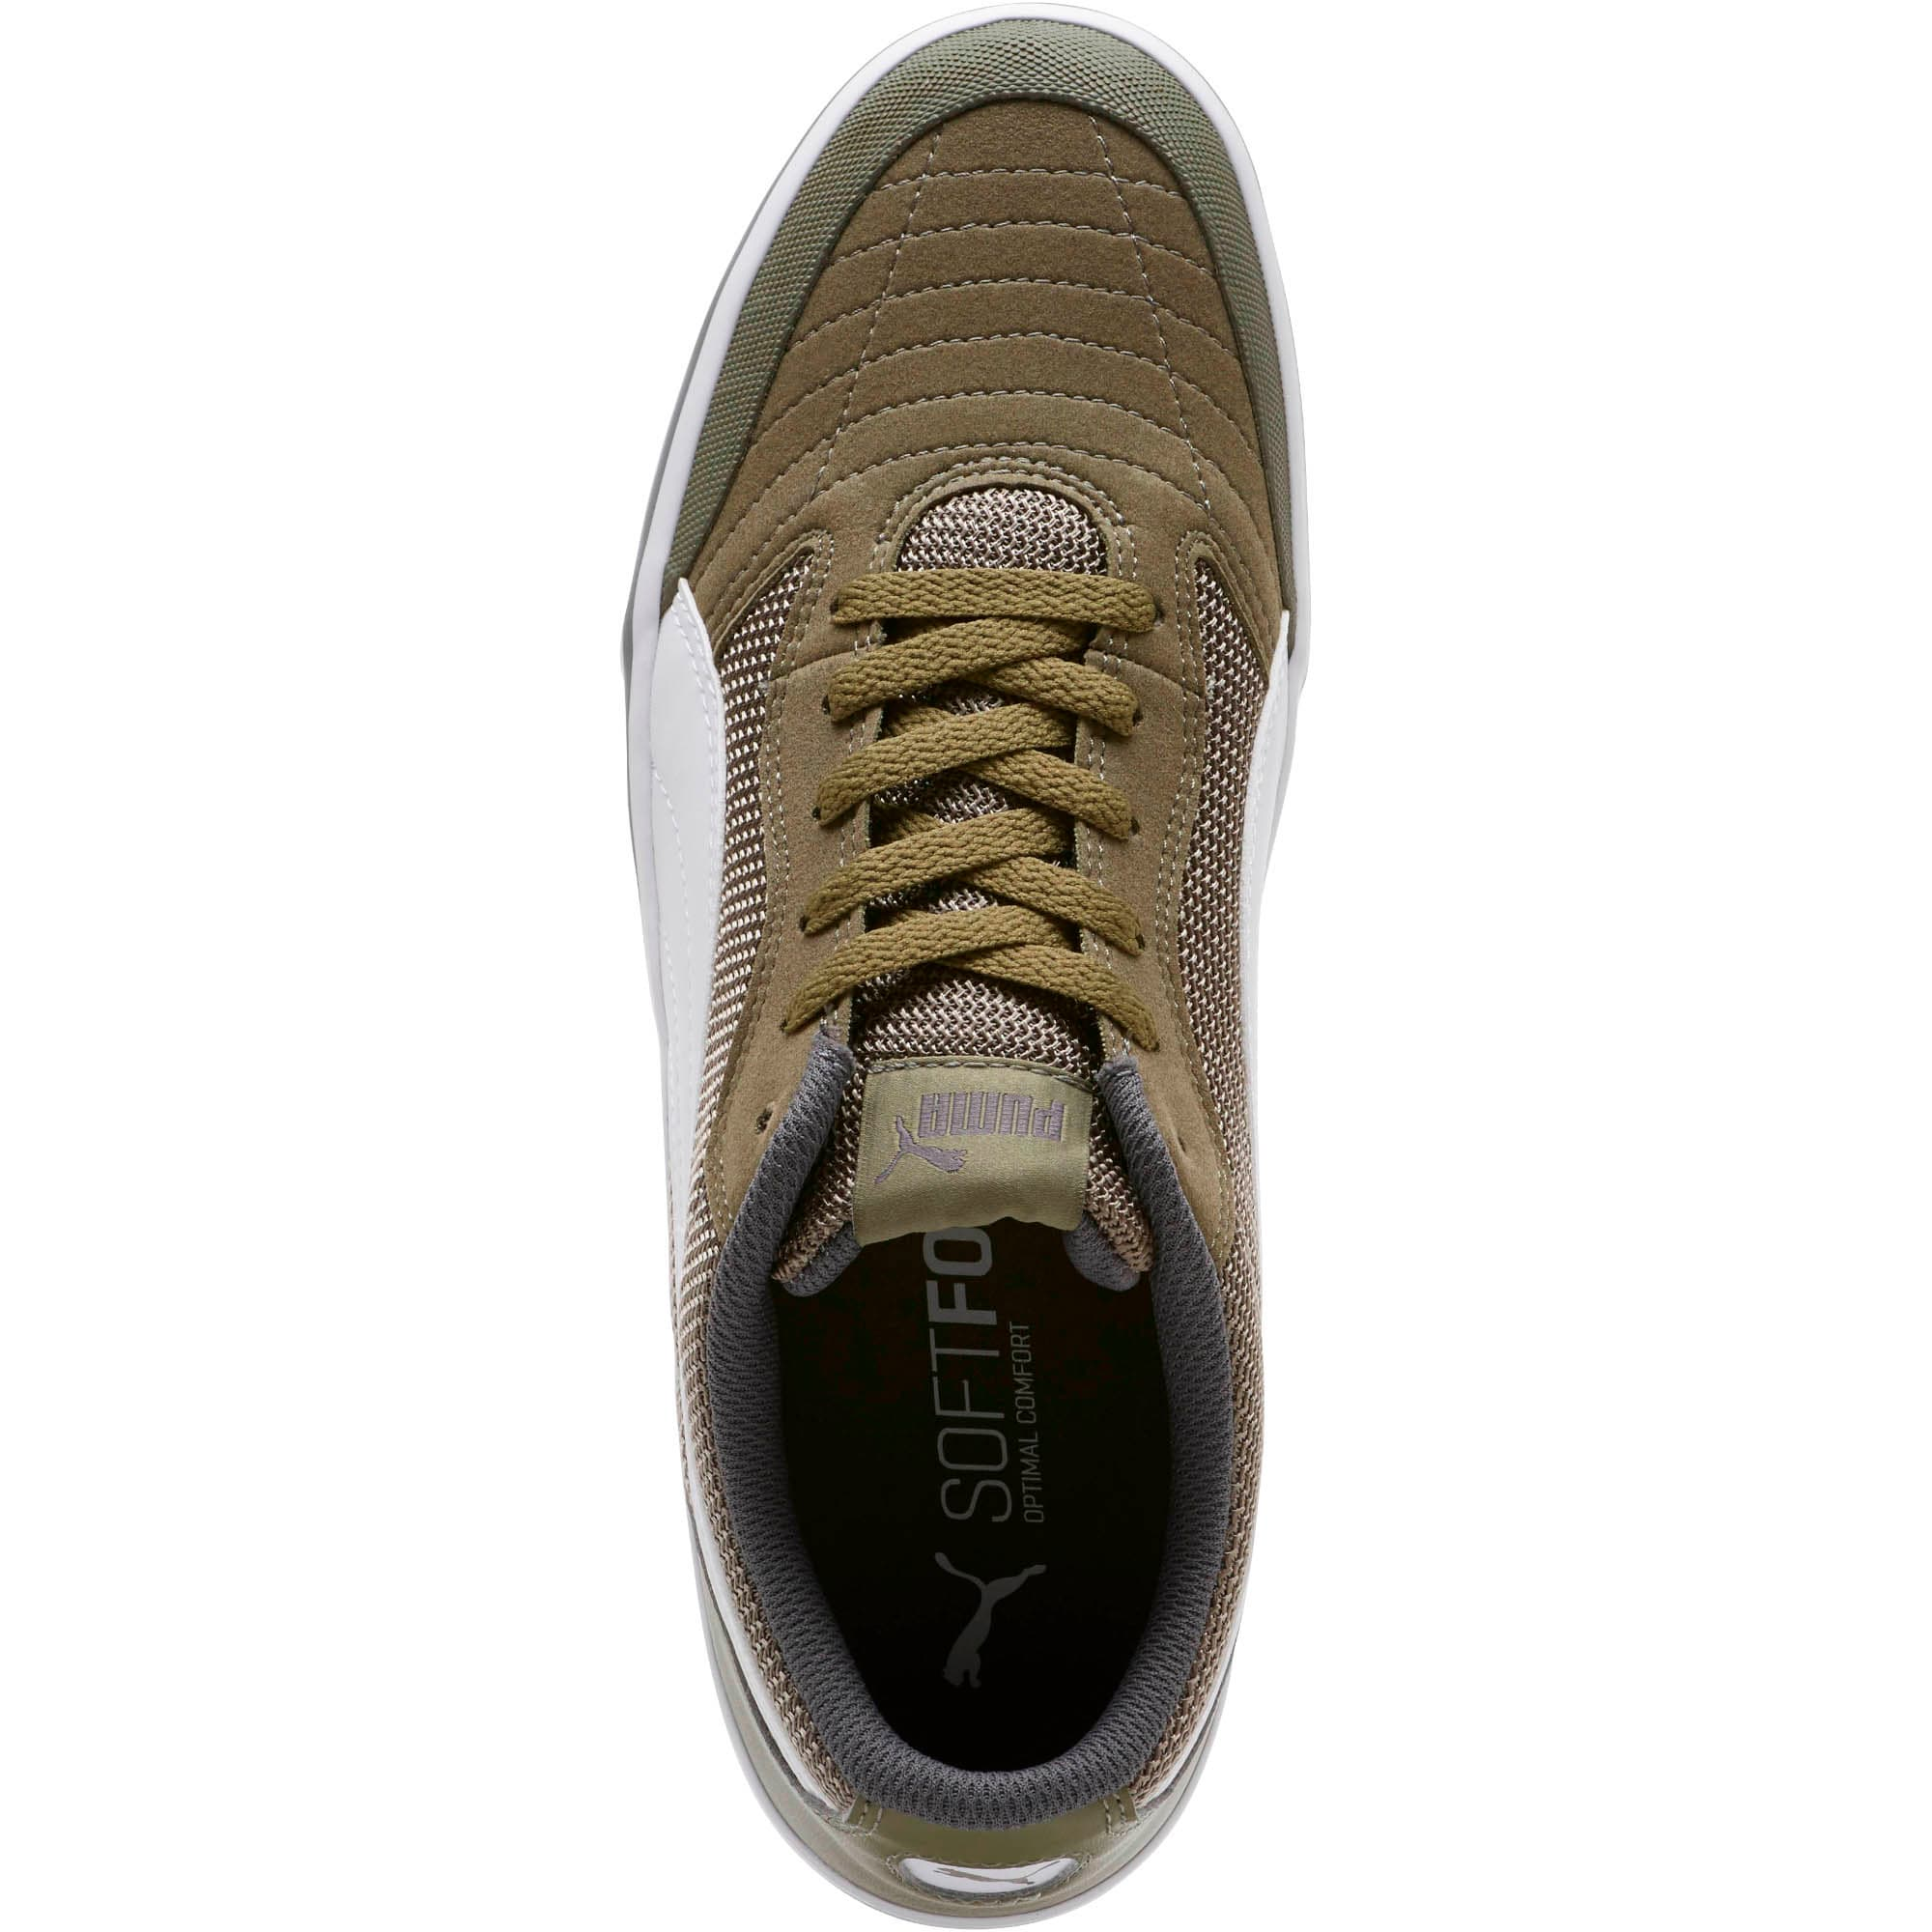 Thumbnail 5 of Astro Sala Sneakers, Burnt Olive-Puma White, medium